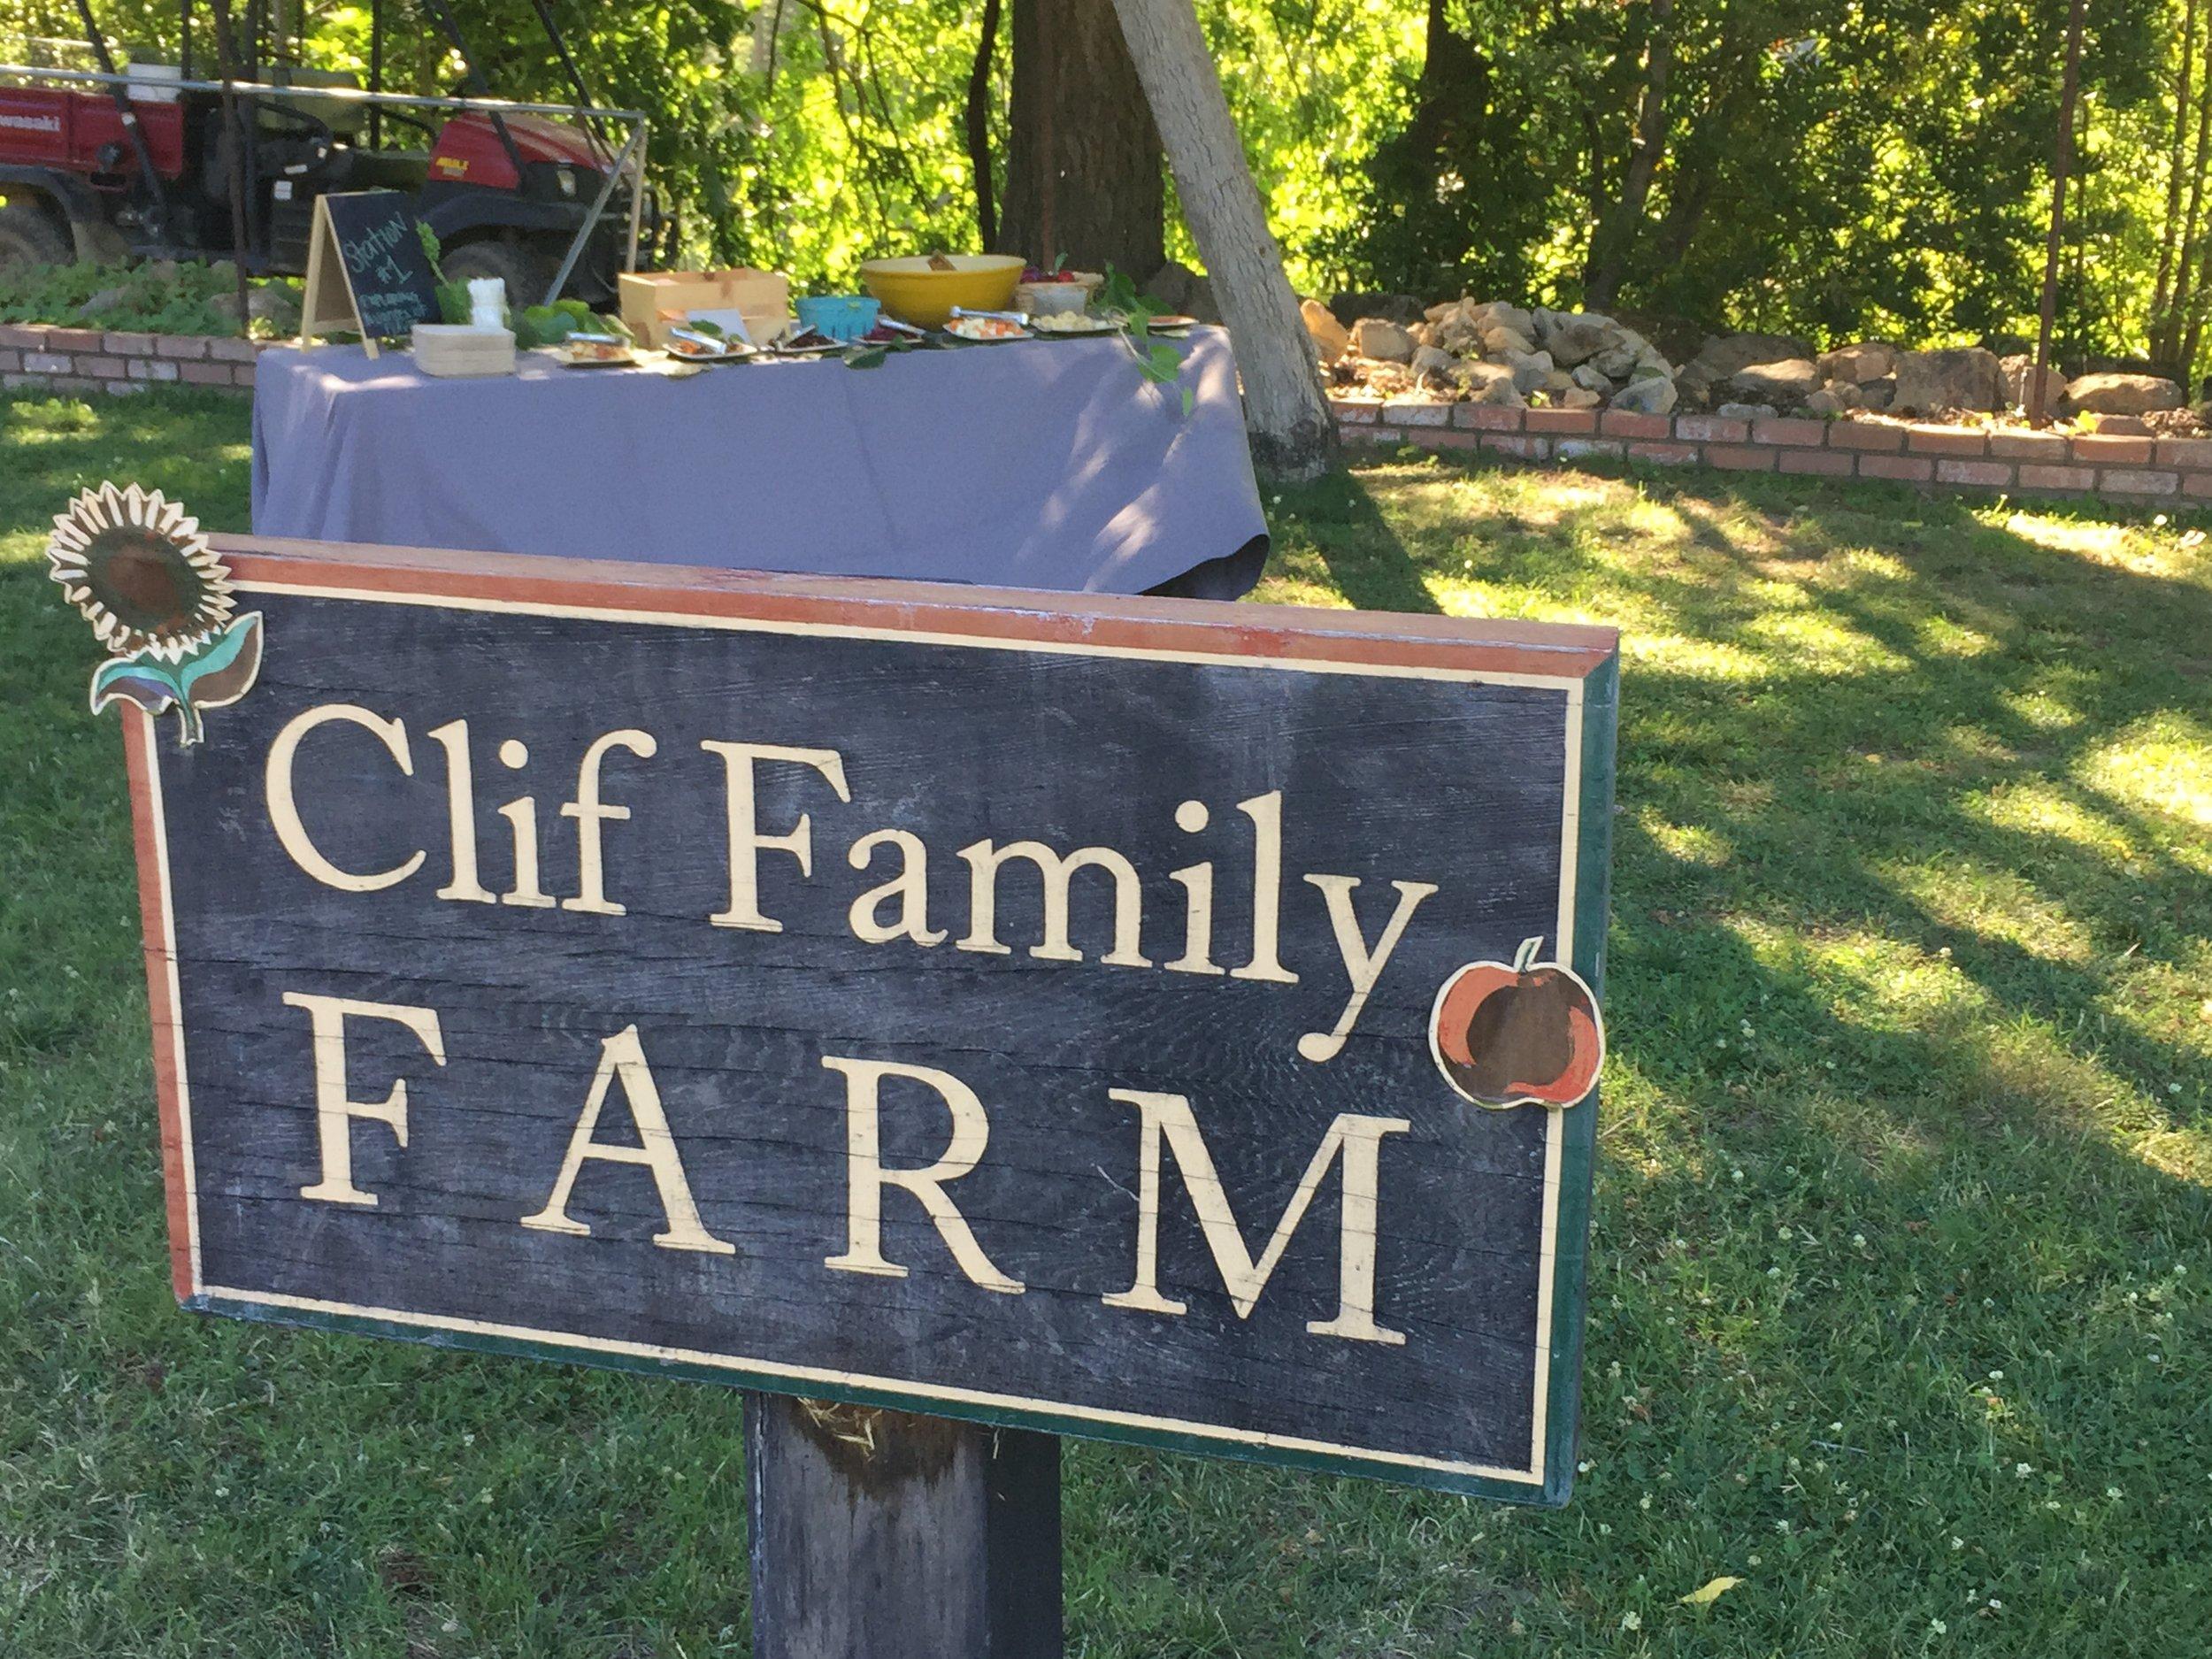 Clif Family Organic Farm in Napa